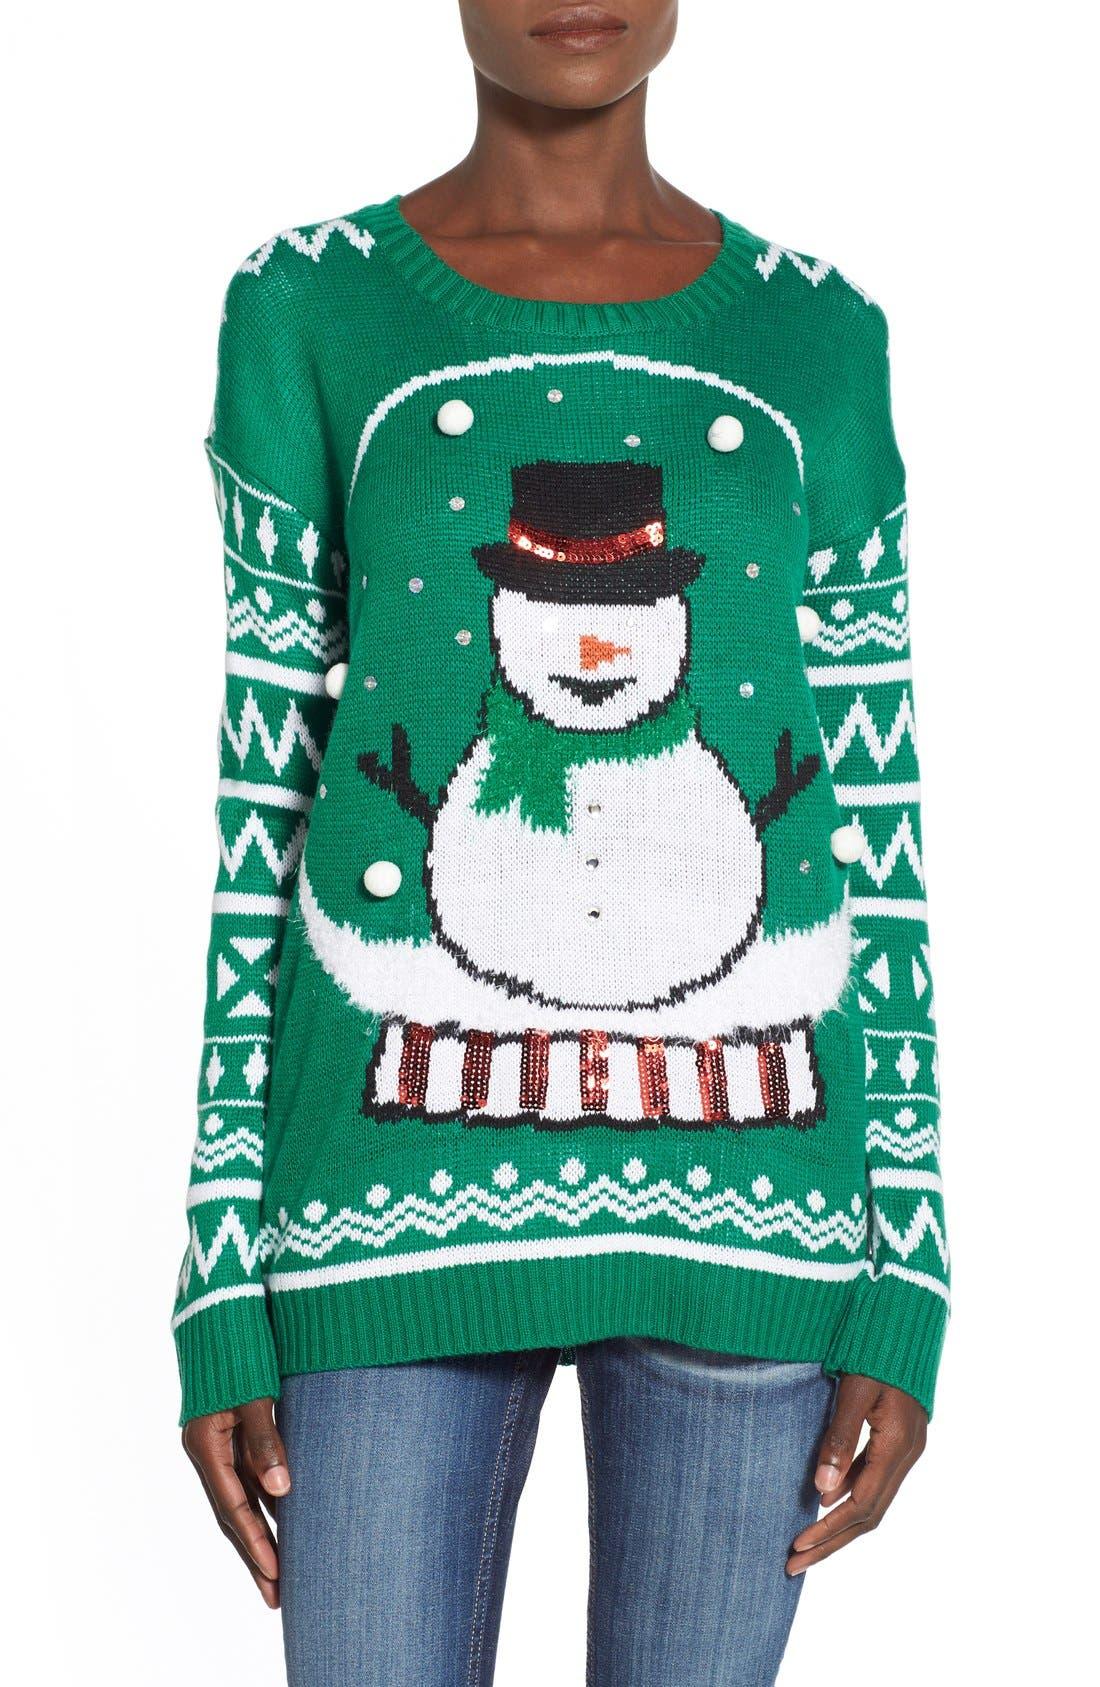 Alternate Image 1 Selected - Derek Heart 'Snow Globe' Musical Christmas Sweater